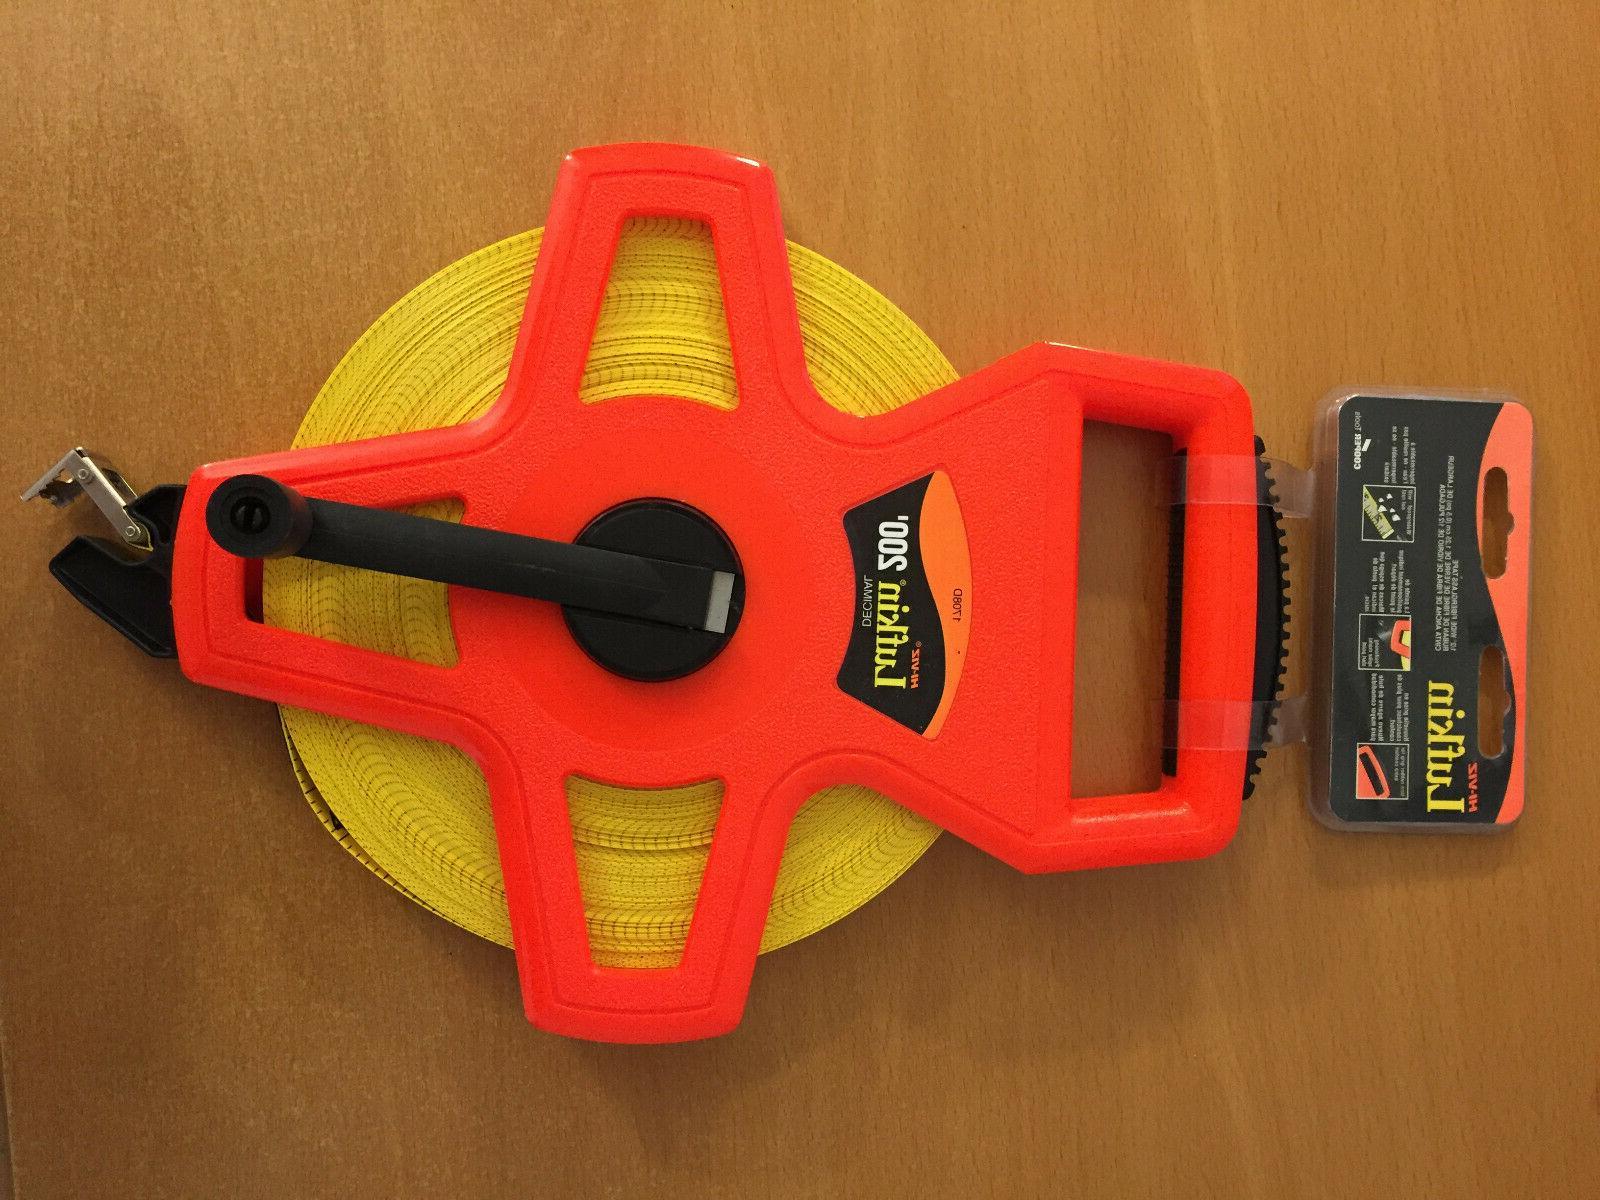 brand new 1708 200 fiberglass long tape